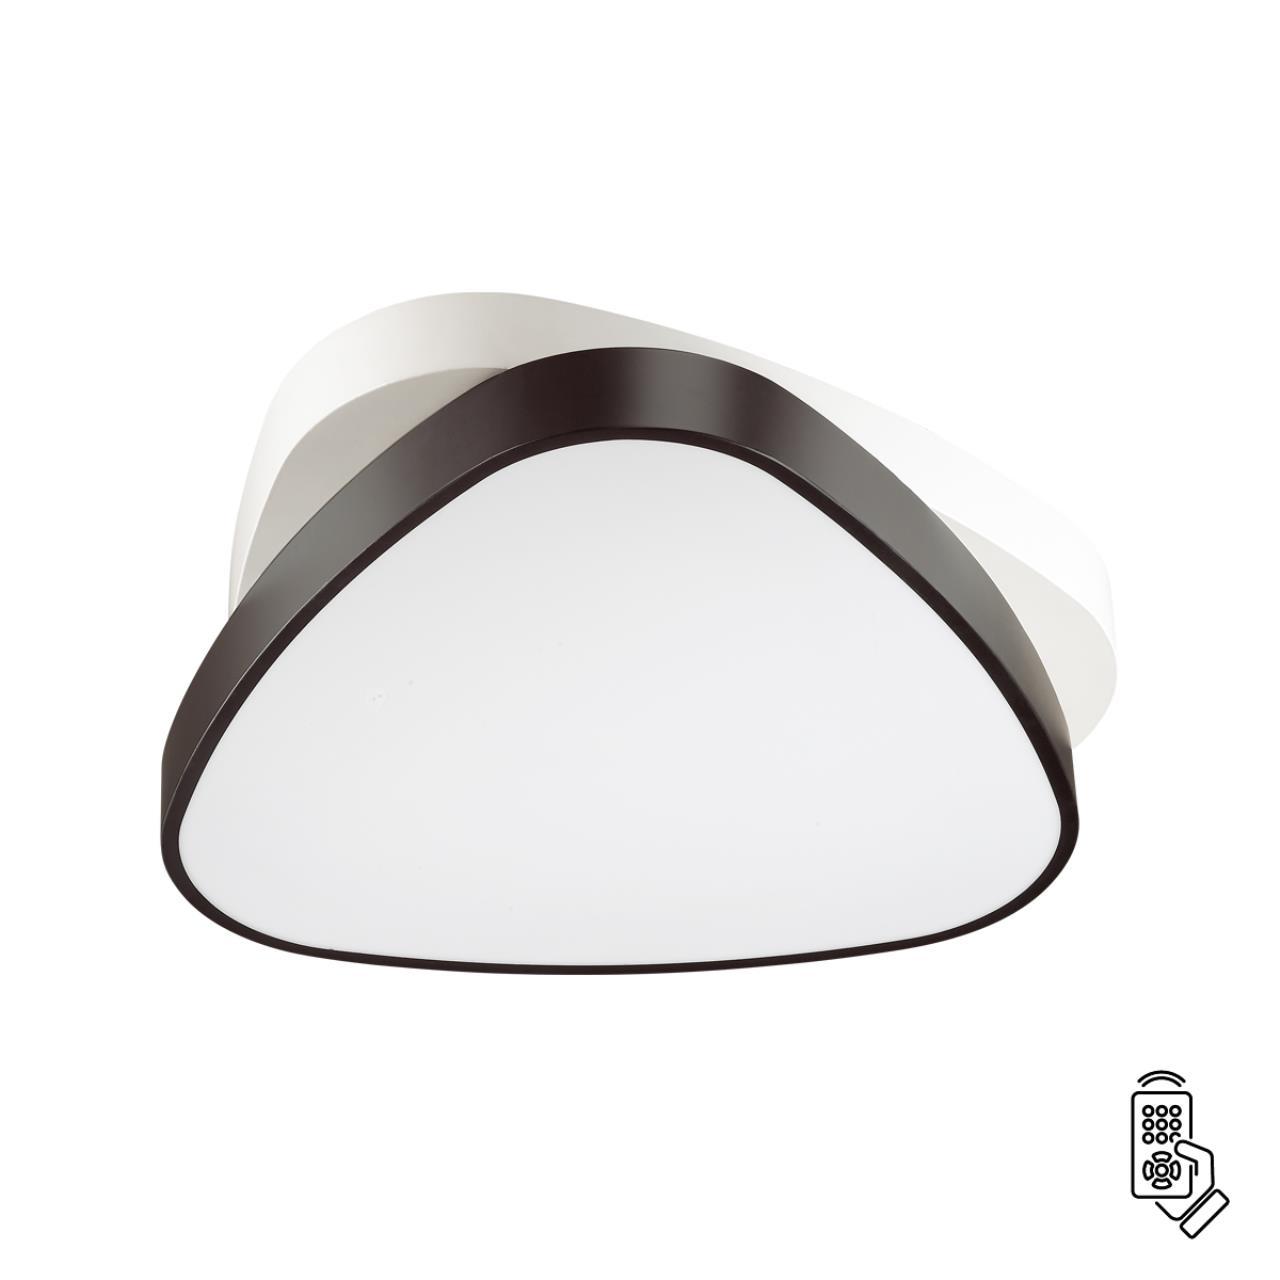 4510/72CL LEDIO LN20 белый, черный Люстра потолочная LED 72W 220V AGATHA